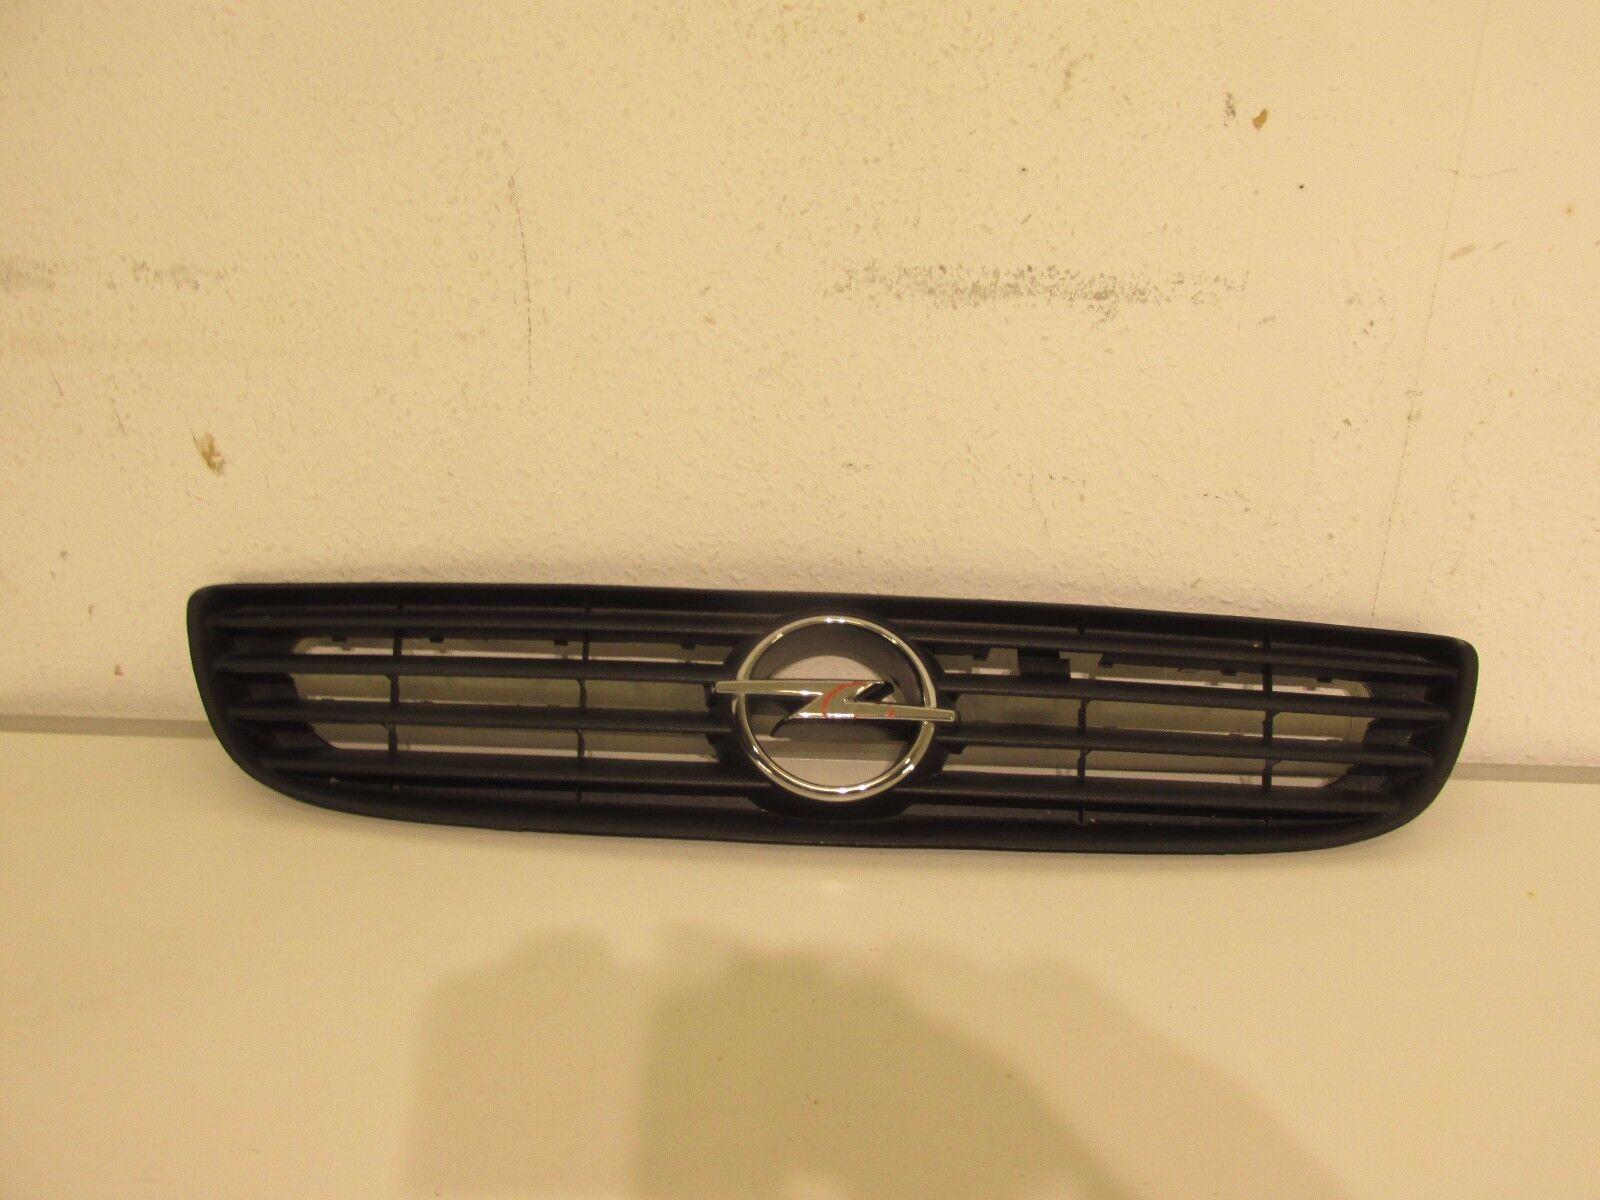 Opel Zafira A original Grill Frontmaske Frontgrill Kühlergrill - 90580679